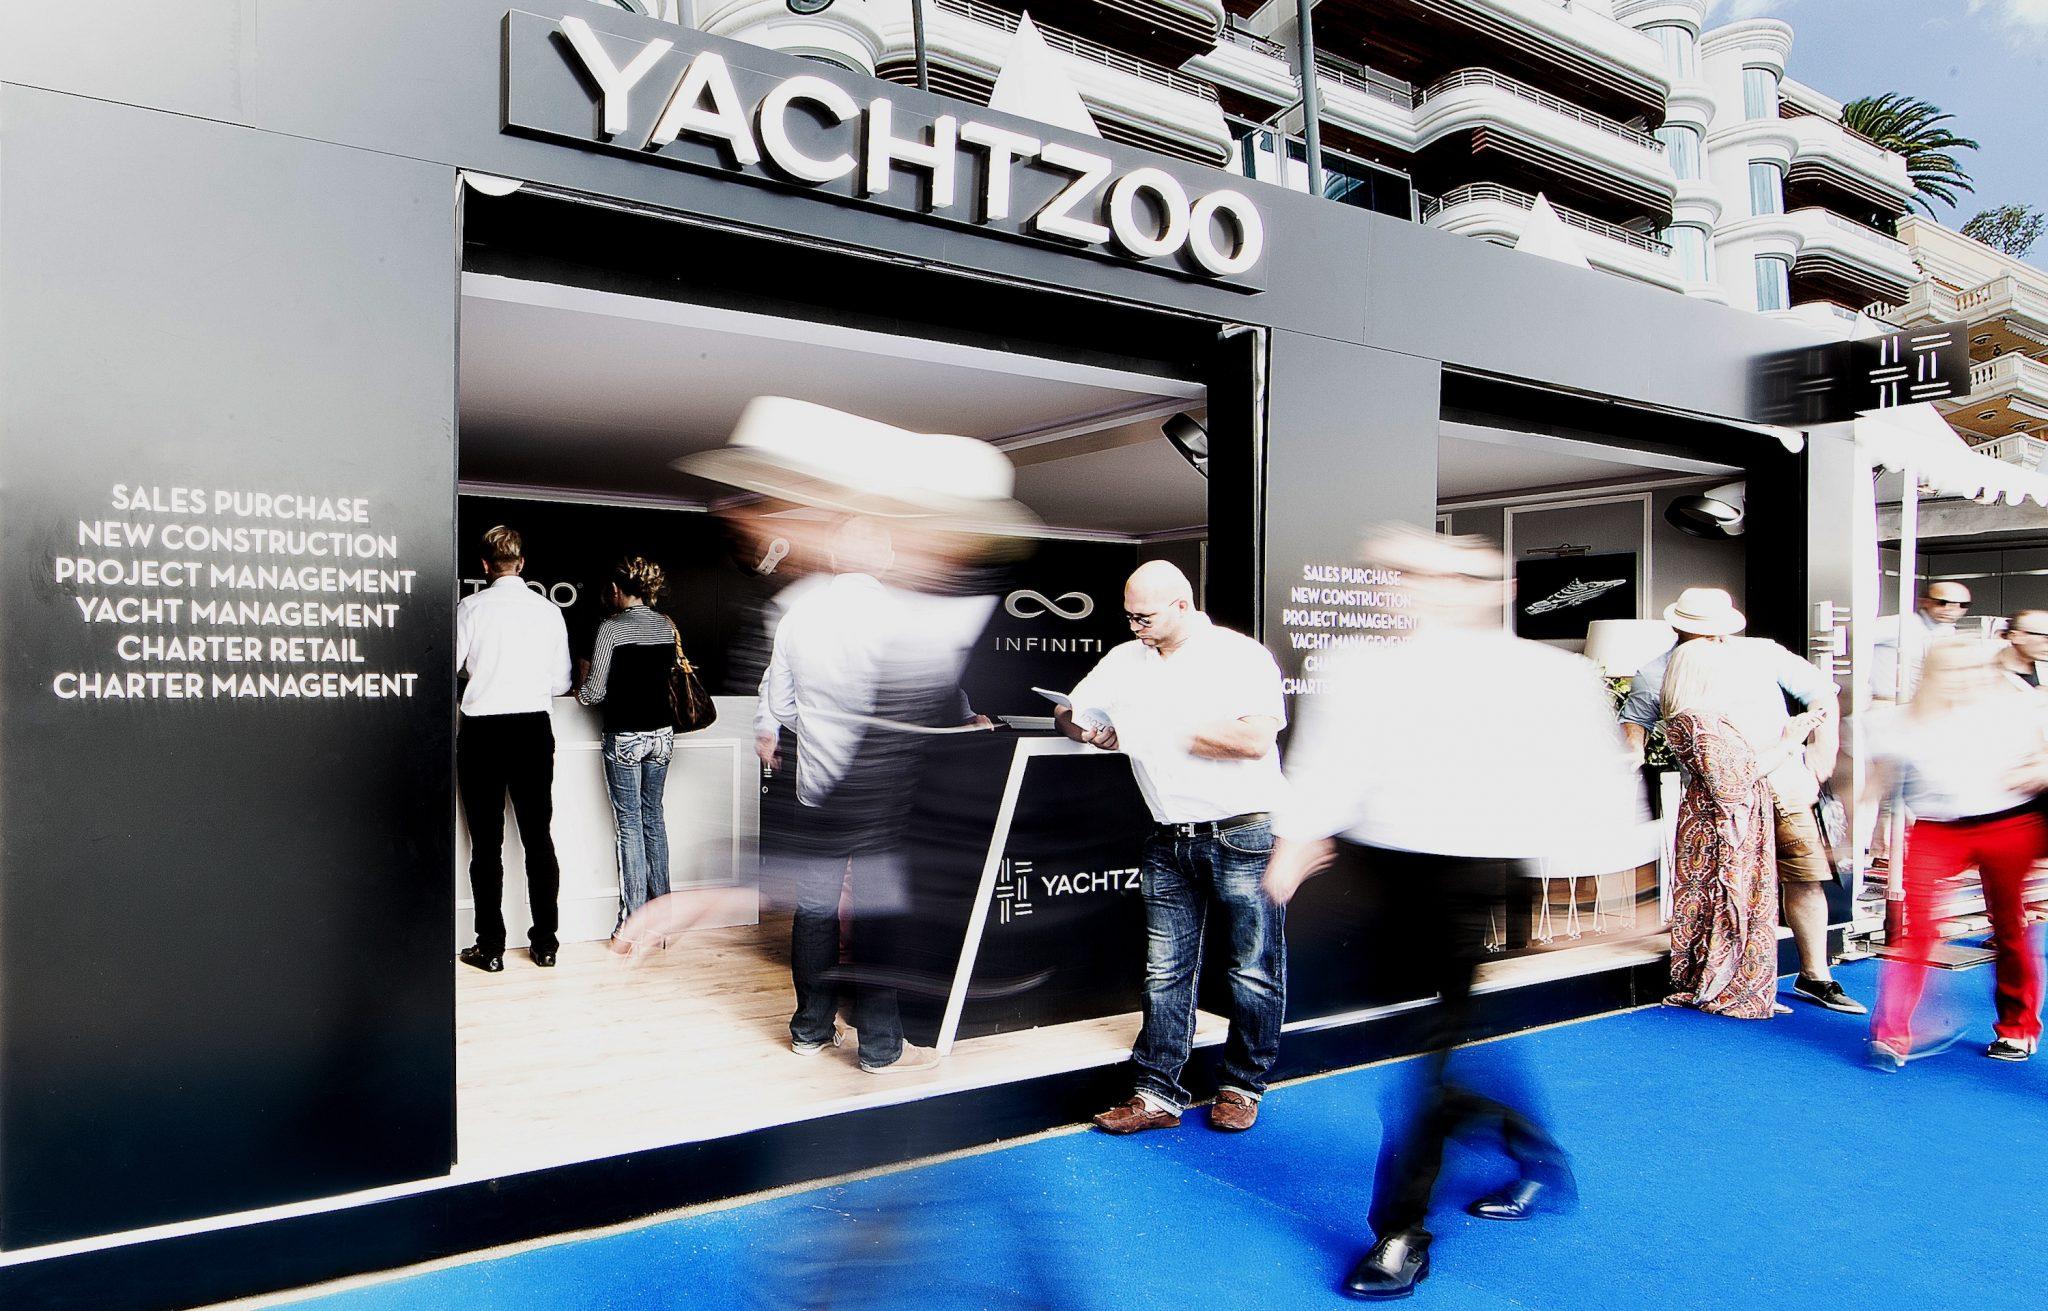 YACHTZOO at The Monaco Yacht Show 2019